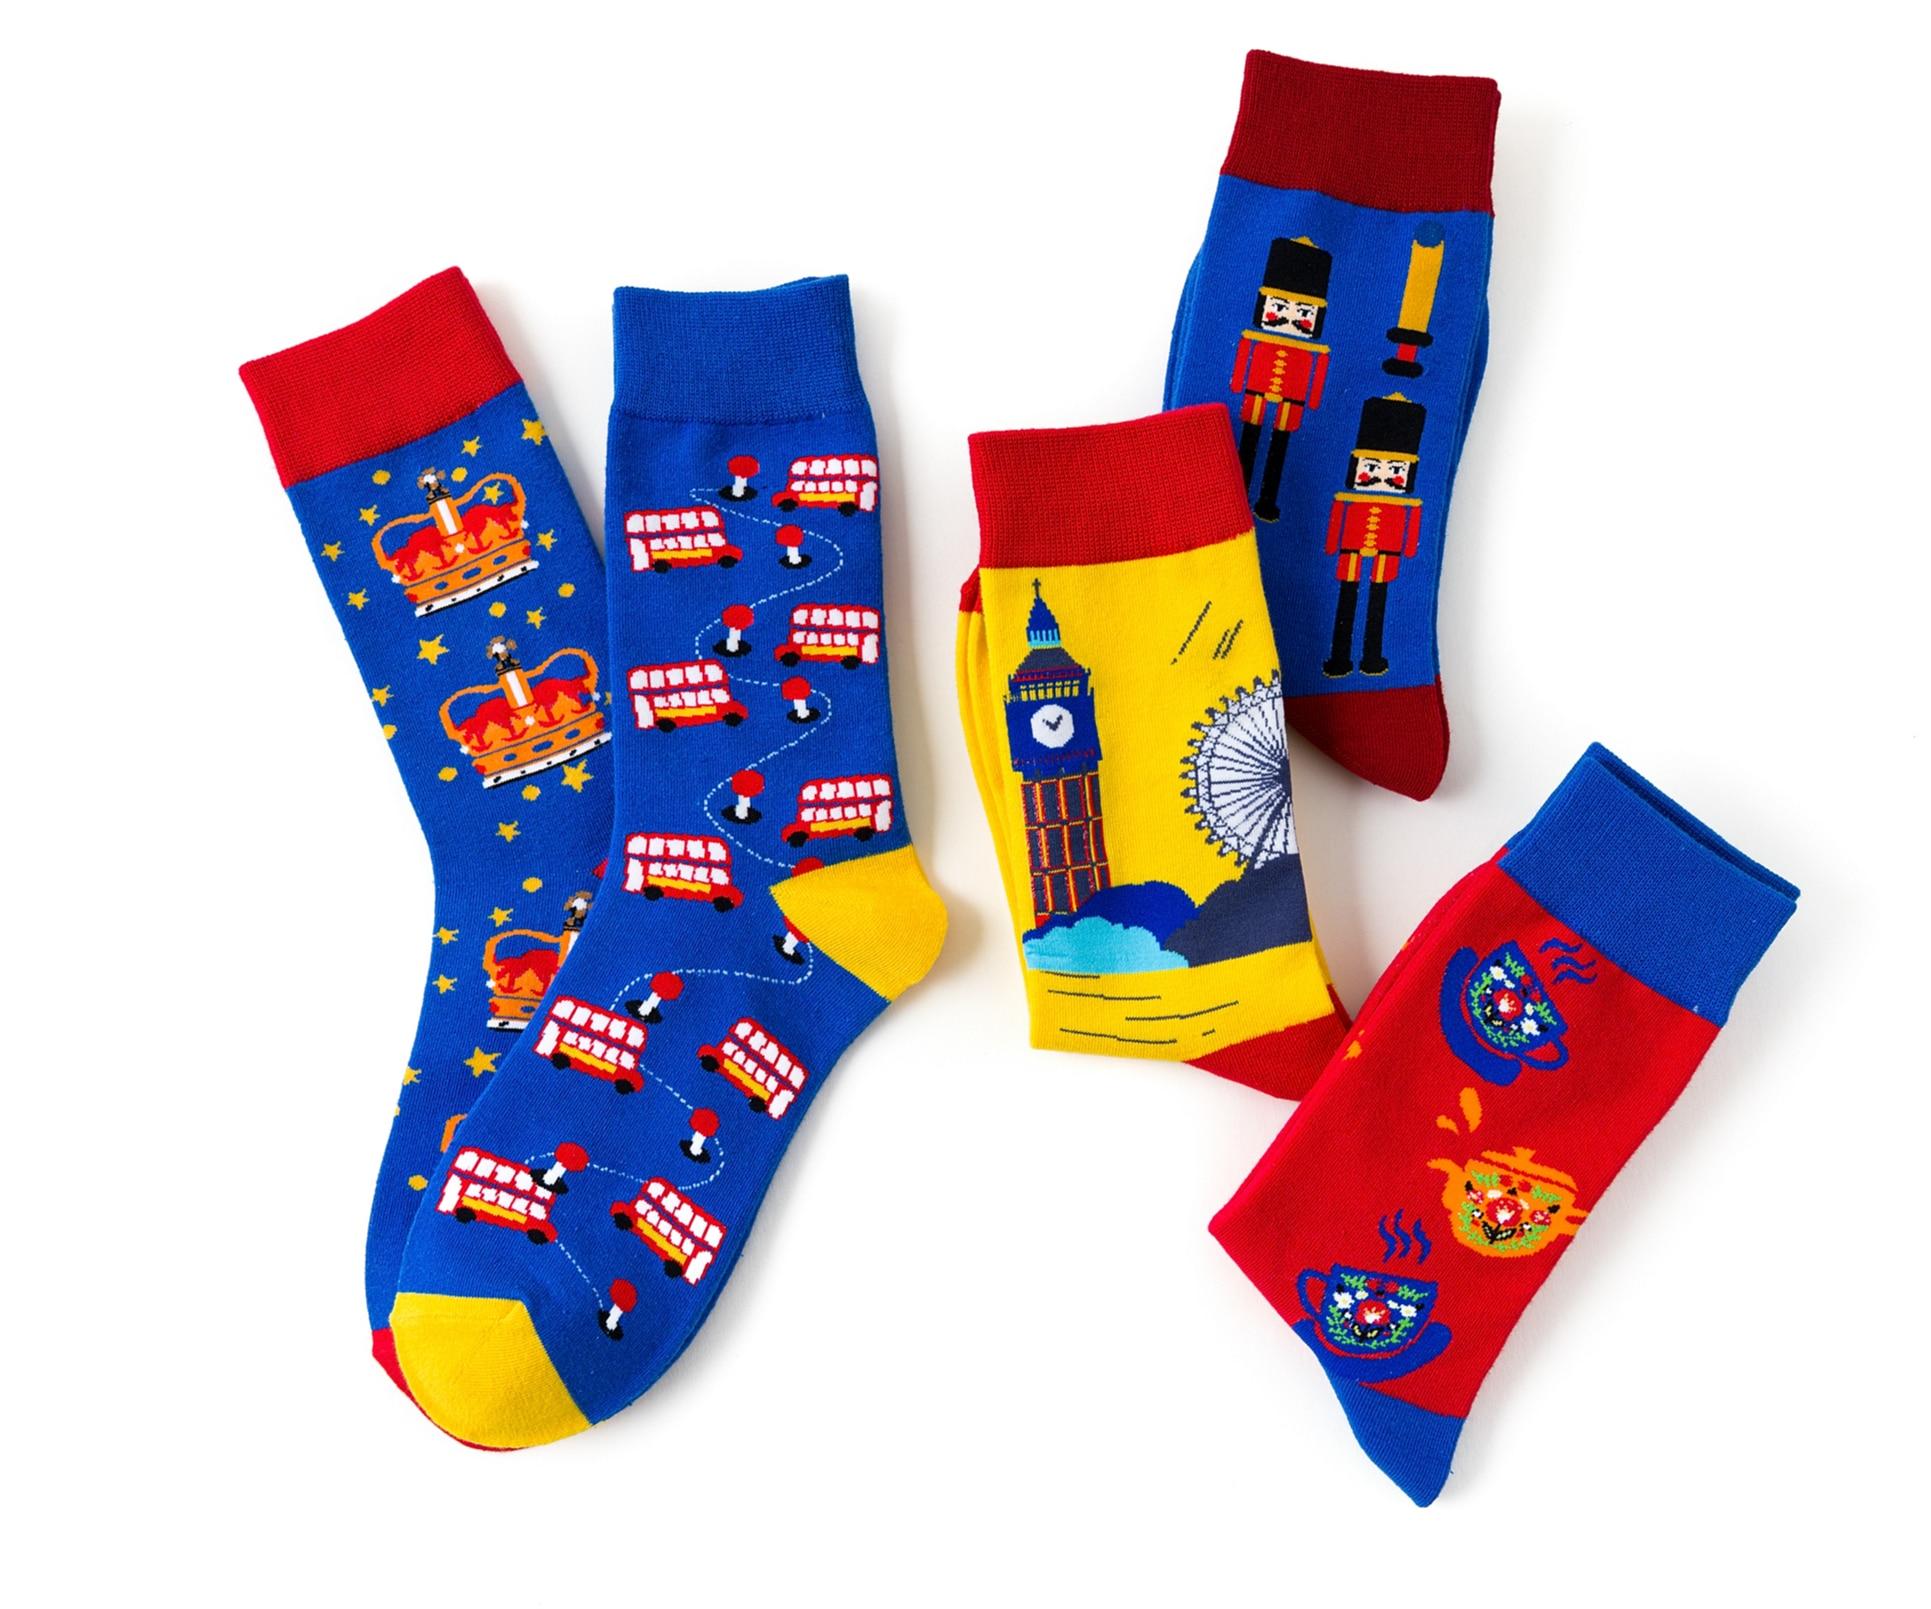 Art Women Socks Man England Bus Crown Cotton Fashion Cool Happy S Personality Special Ocks Funny Socks Adult Casual Crew Socks